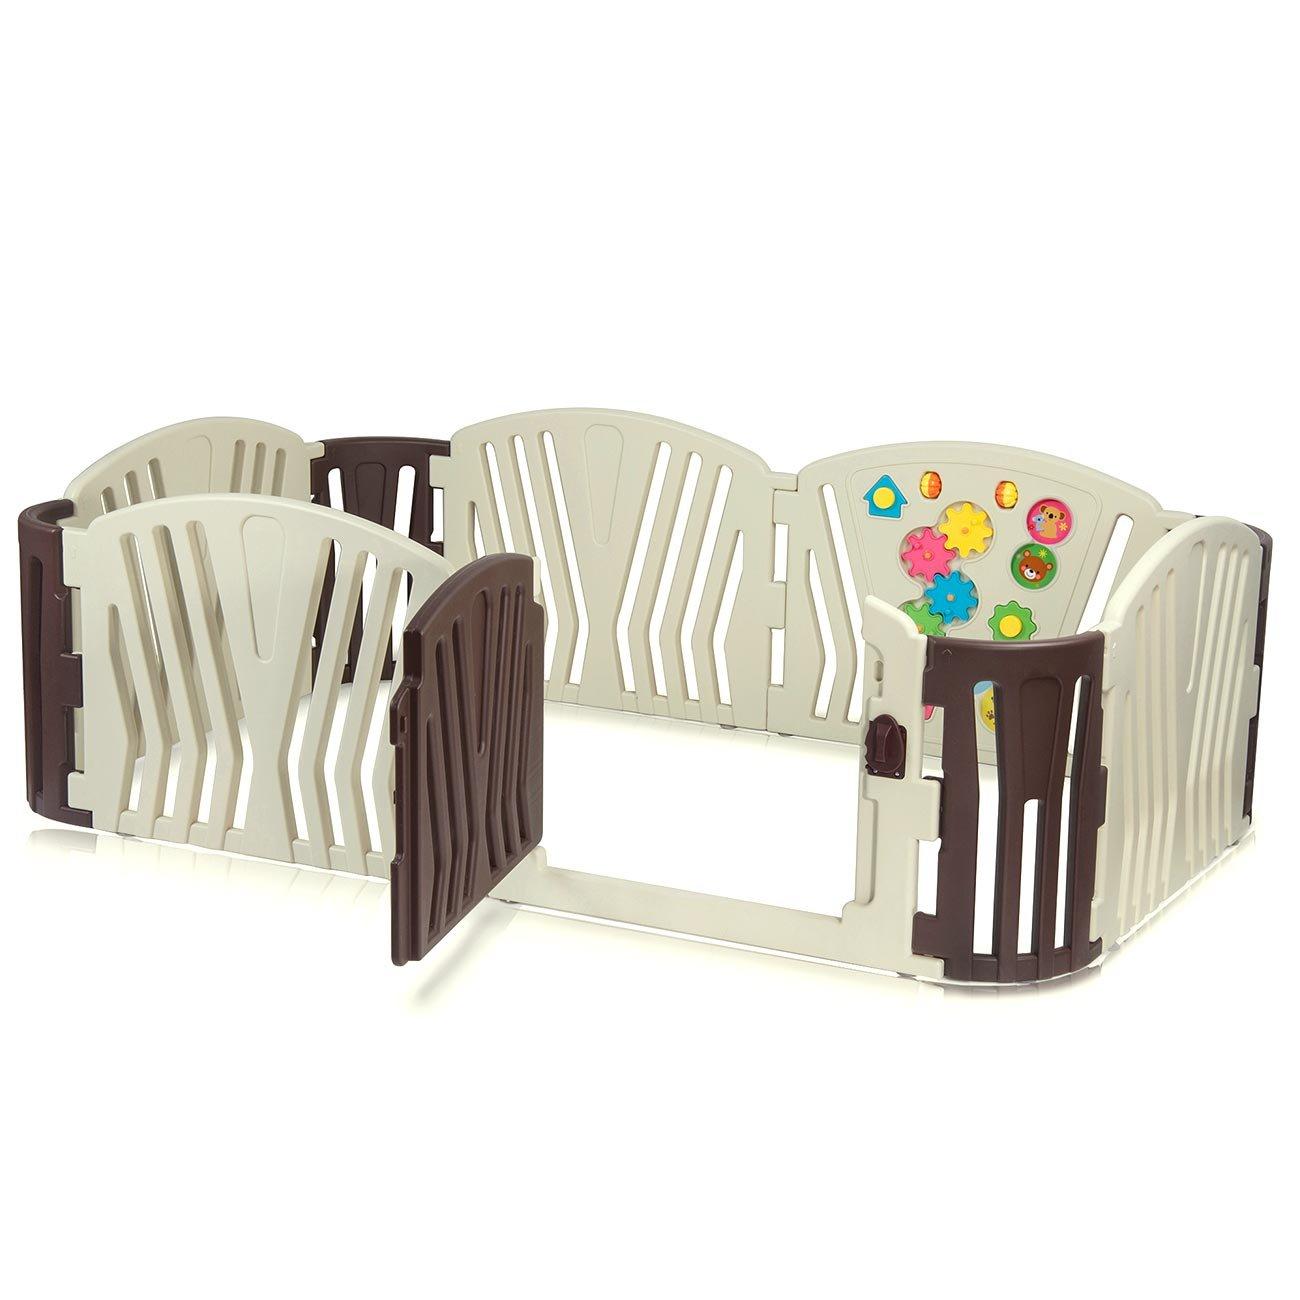 Baby Vivo Parque Infantil Plástico 10 Elementos - Brown product image